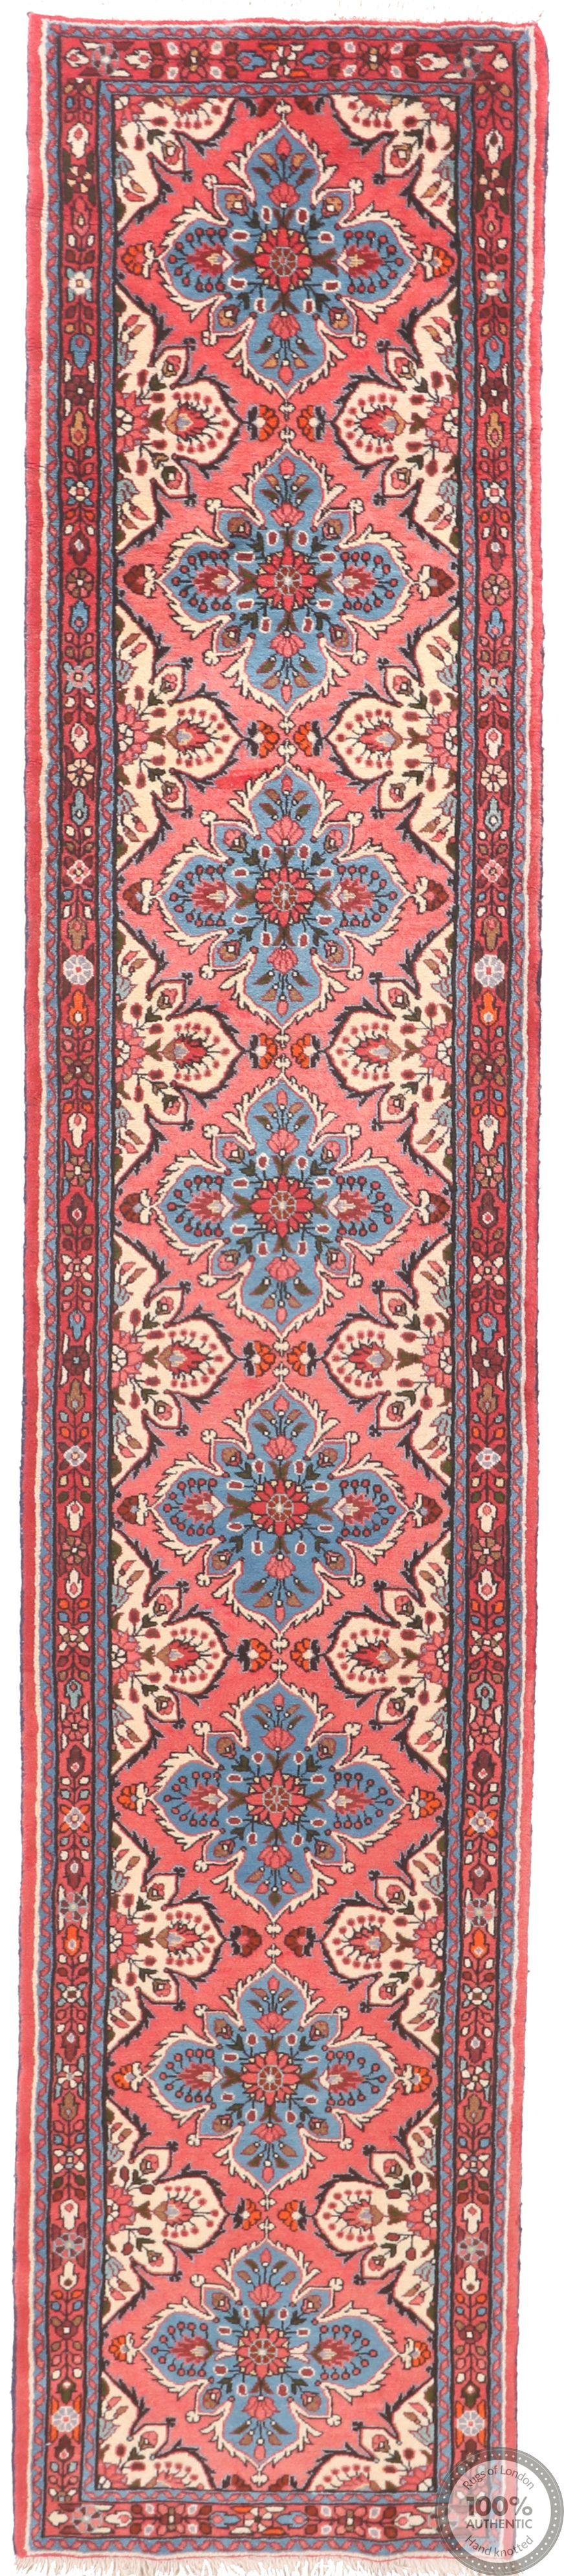 Persian Roodbar Runner - Pink - 14'1 x 2'7